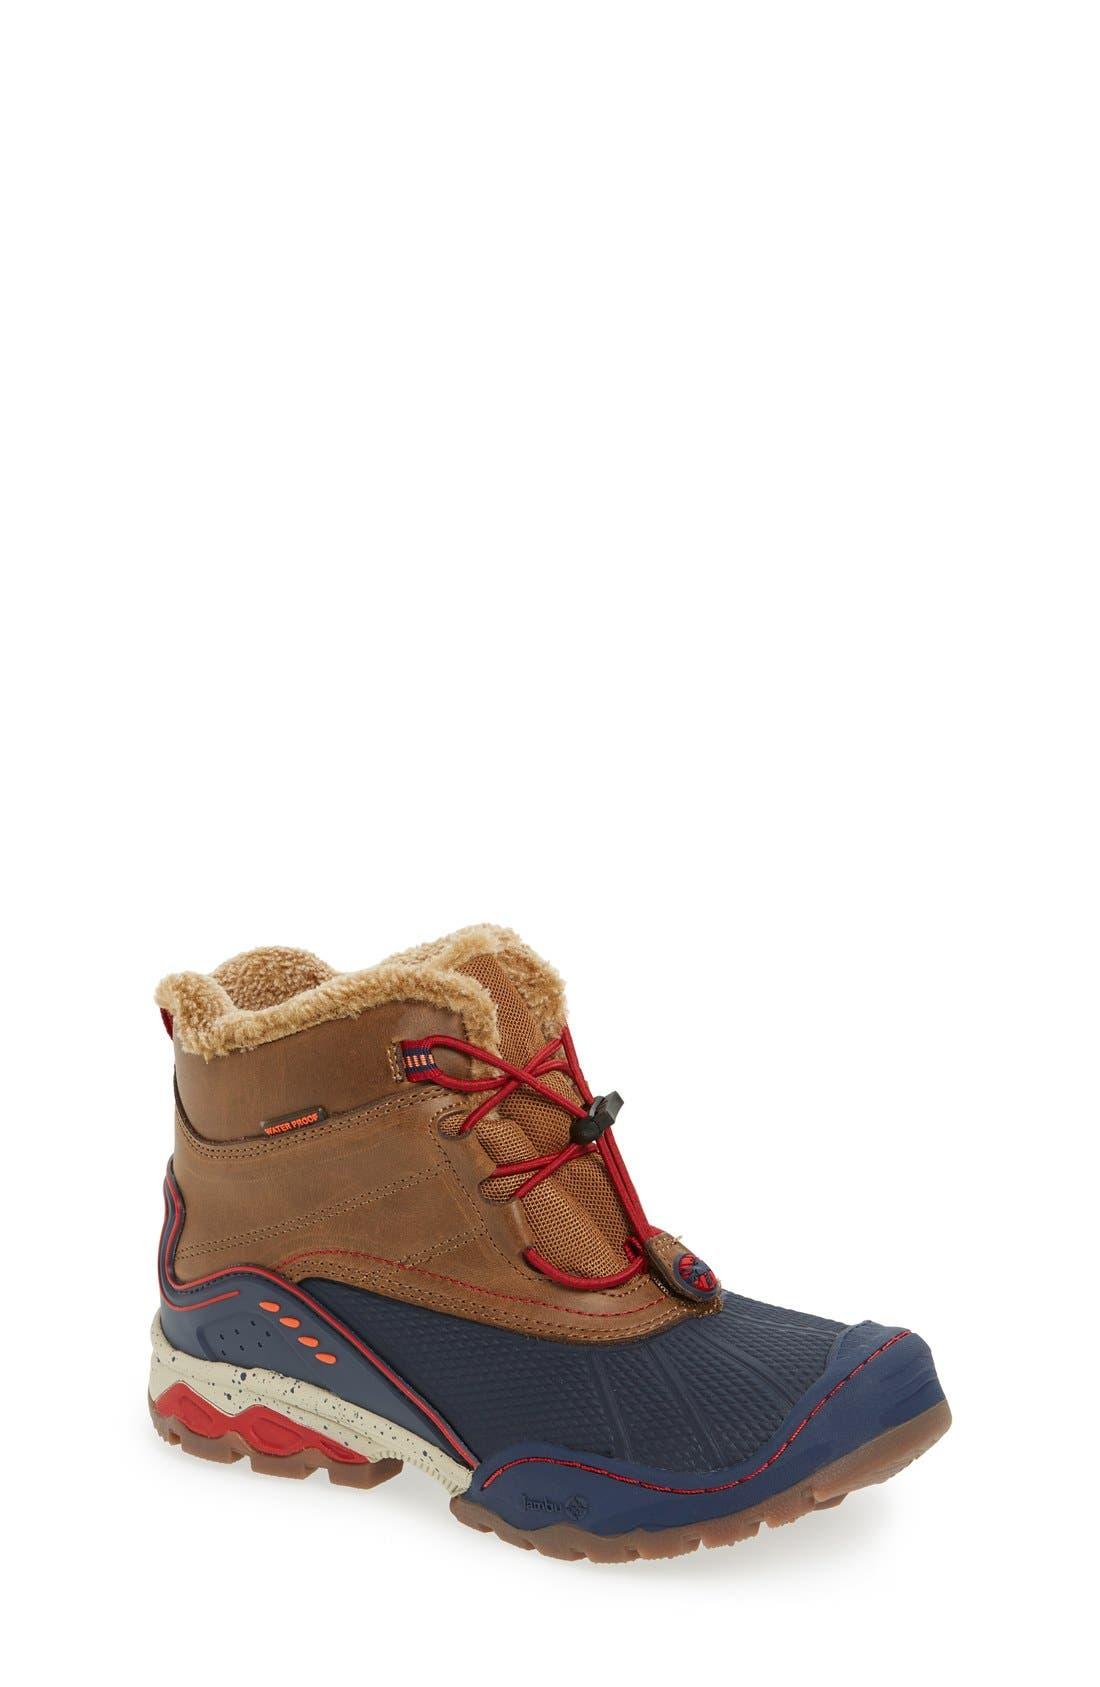 'Baltoro 3' Waterproof Insulated Snow Boot,                         Main,                         color, BROWN/ NAVY